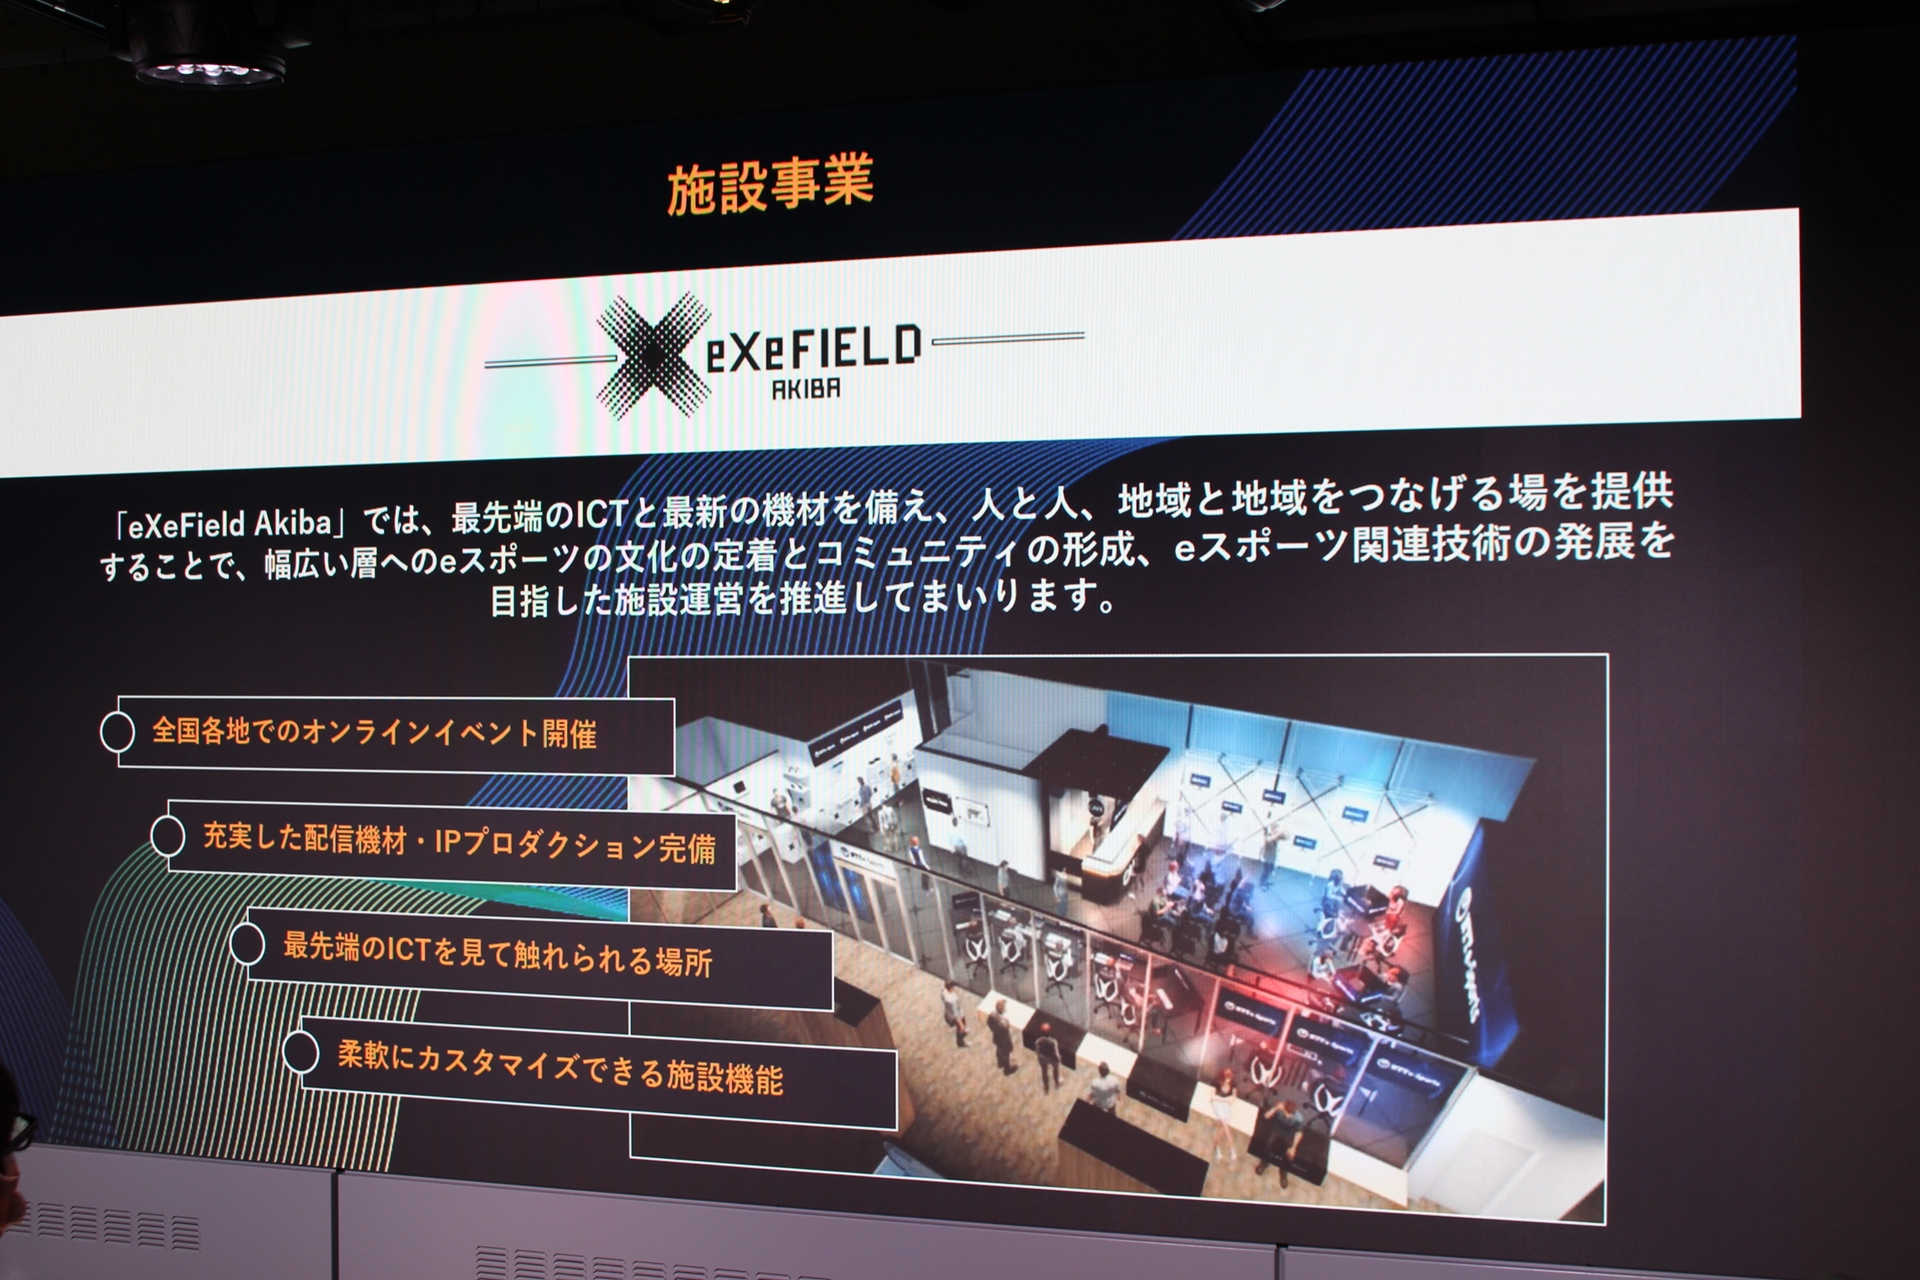 「eXeField Akiba」は施設面積175平方m、最大収容人数は約80名(立食パーティー形式時)となっている